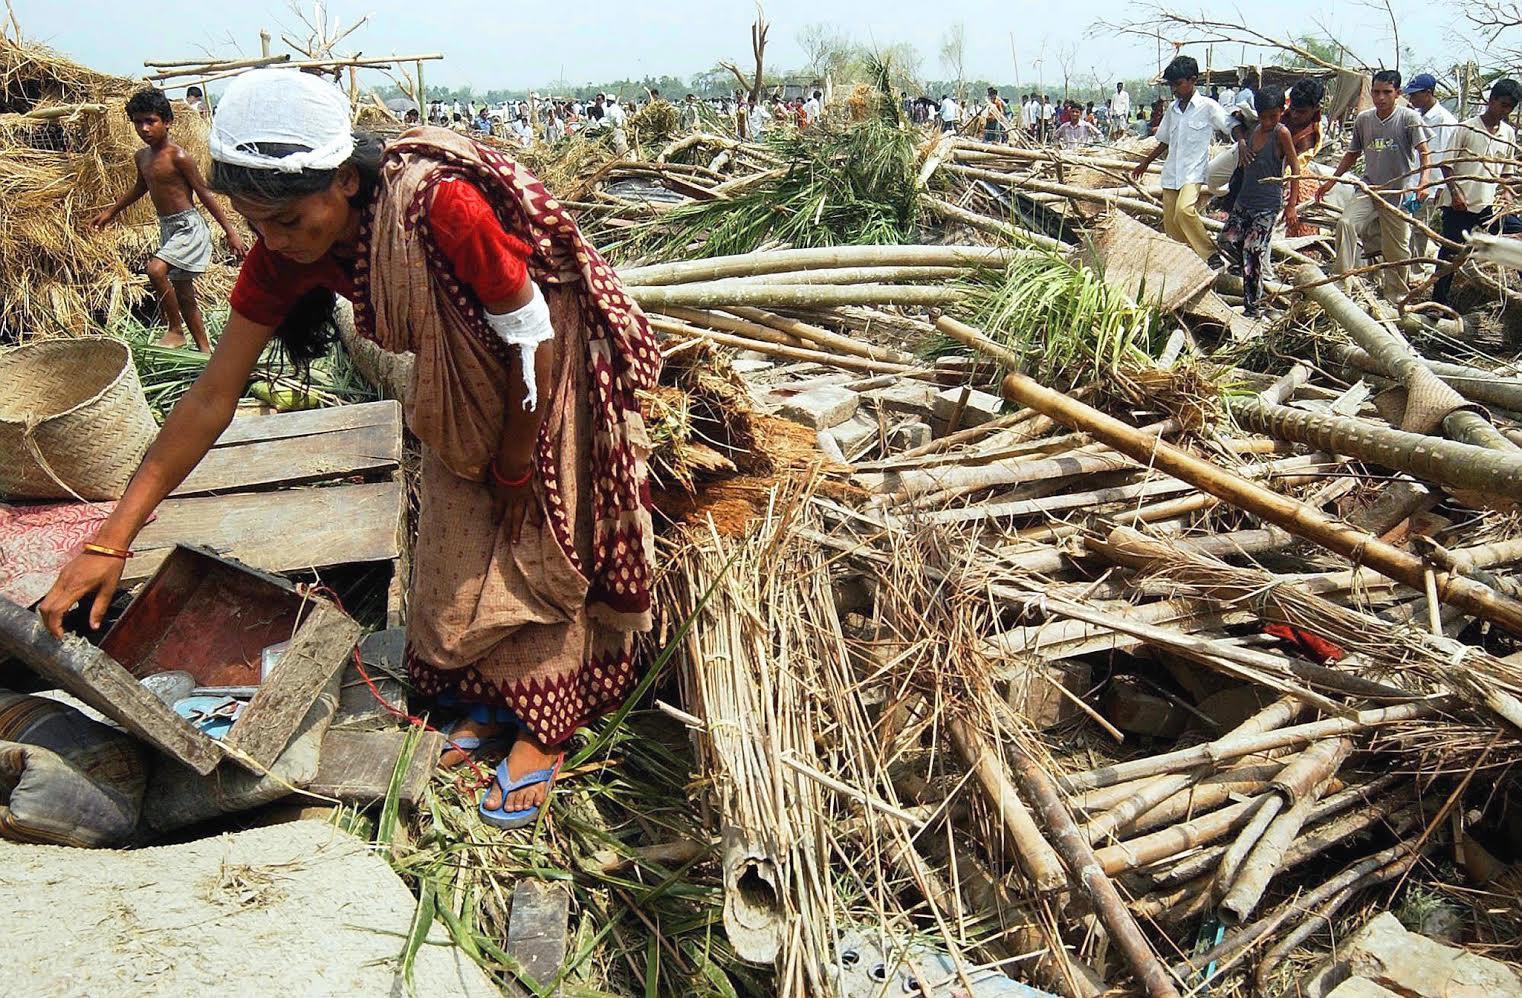 Tornado strikes village in northeastern Bangladesh (1989). Photo epa/Mufty Munir